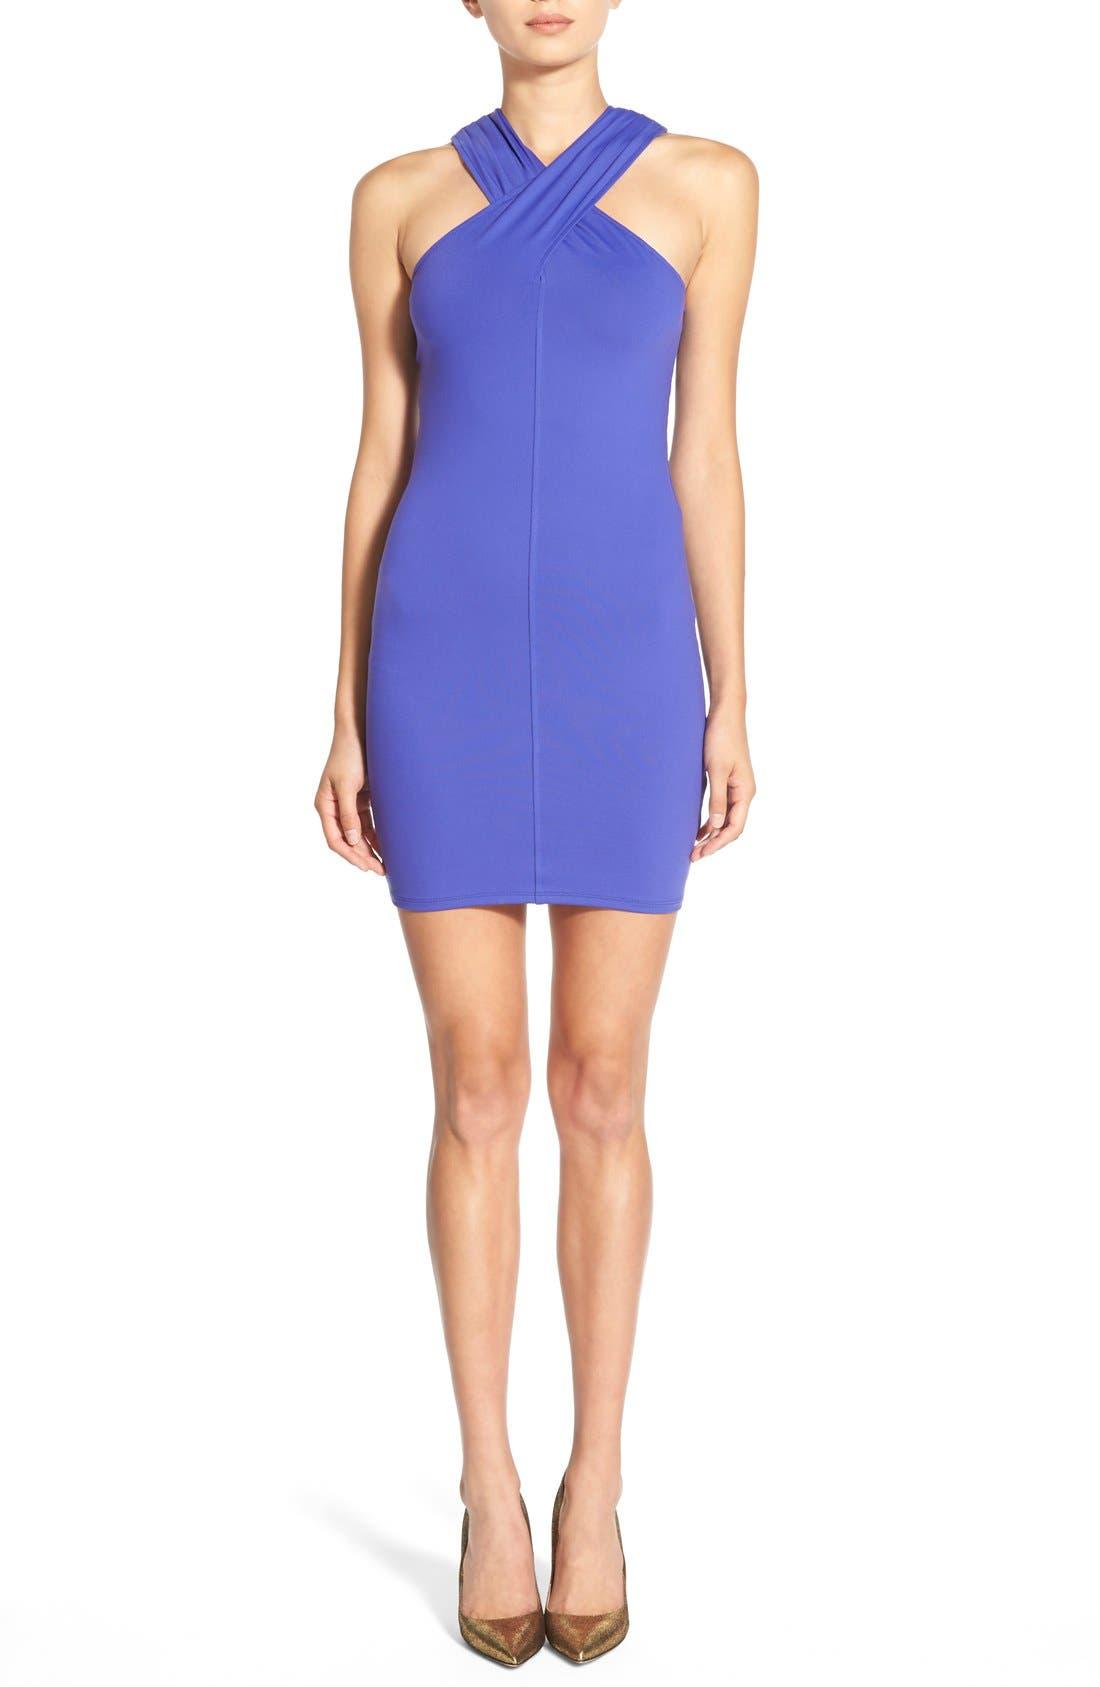 Alternate Image 1 Selected - Leith Cross Neck Body-Con Dress